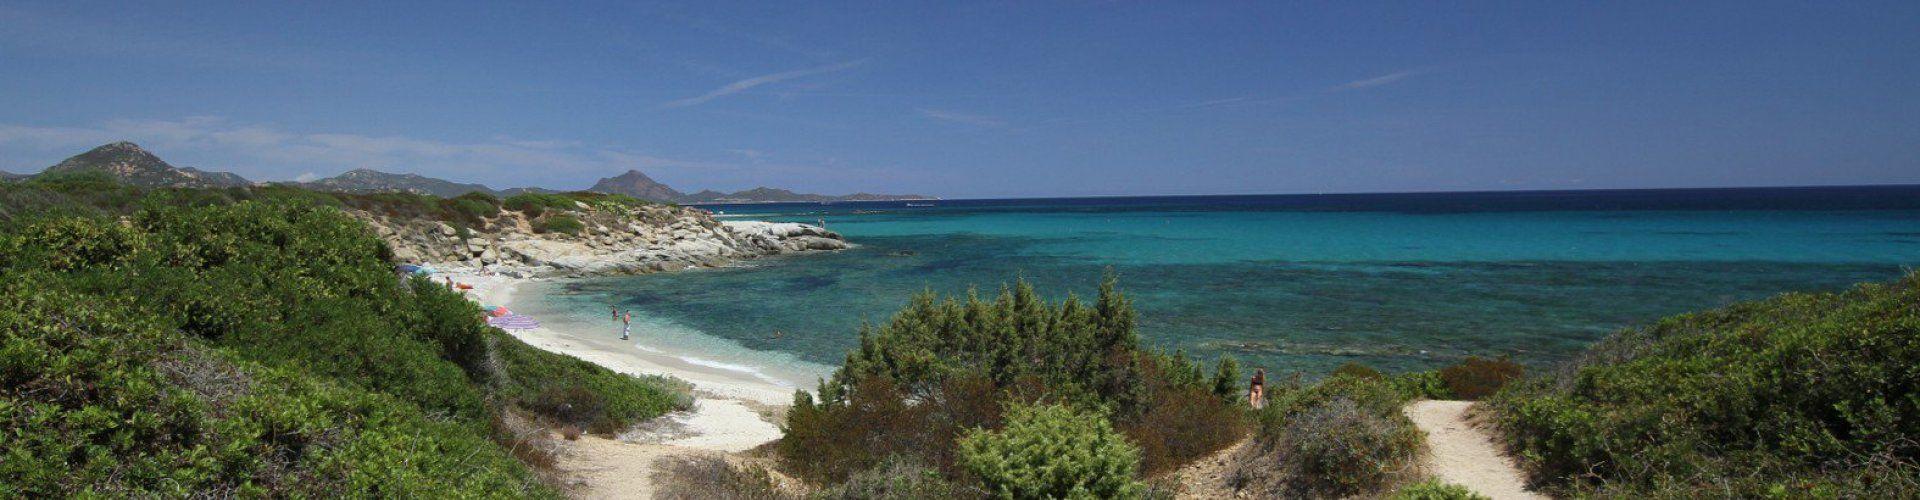 Way to the beach of  Sant Elmo